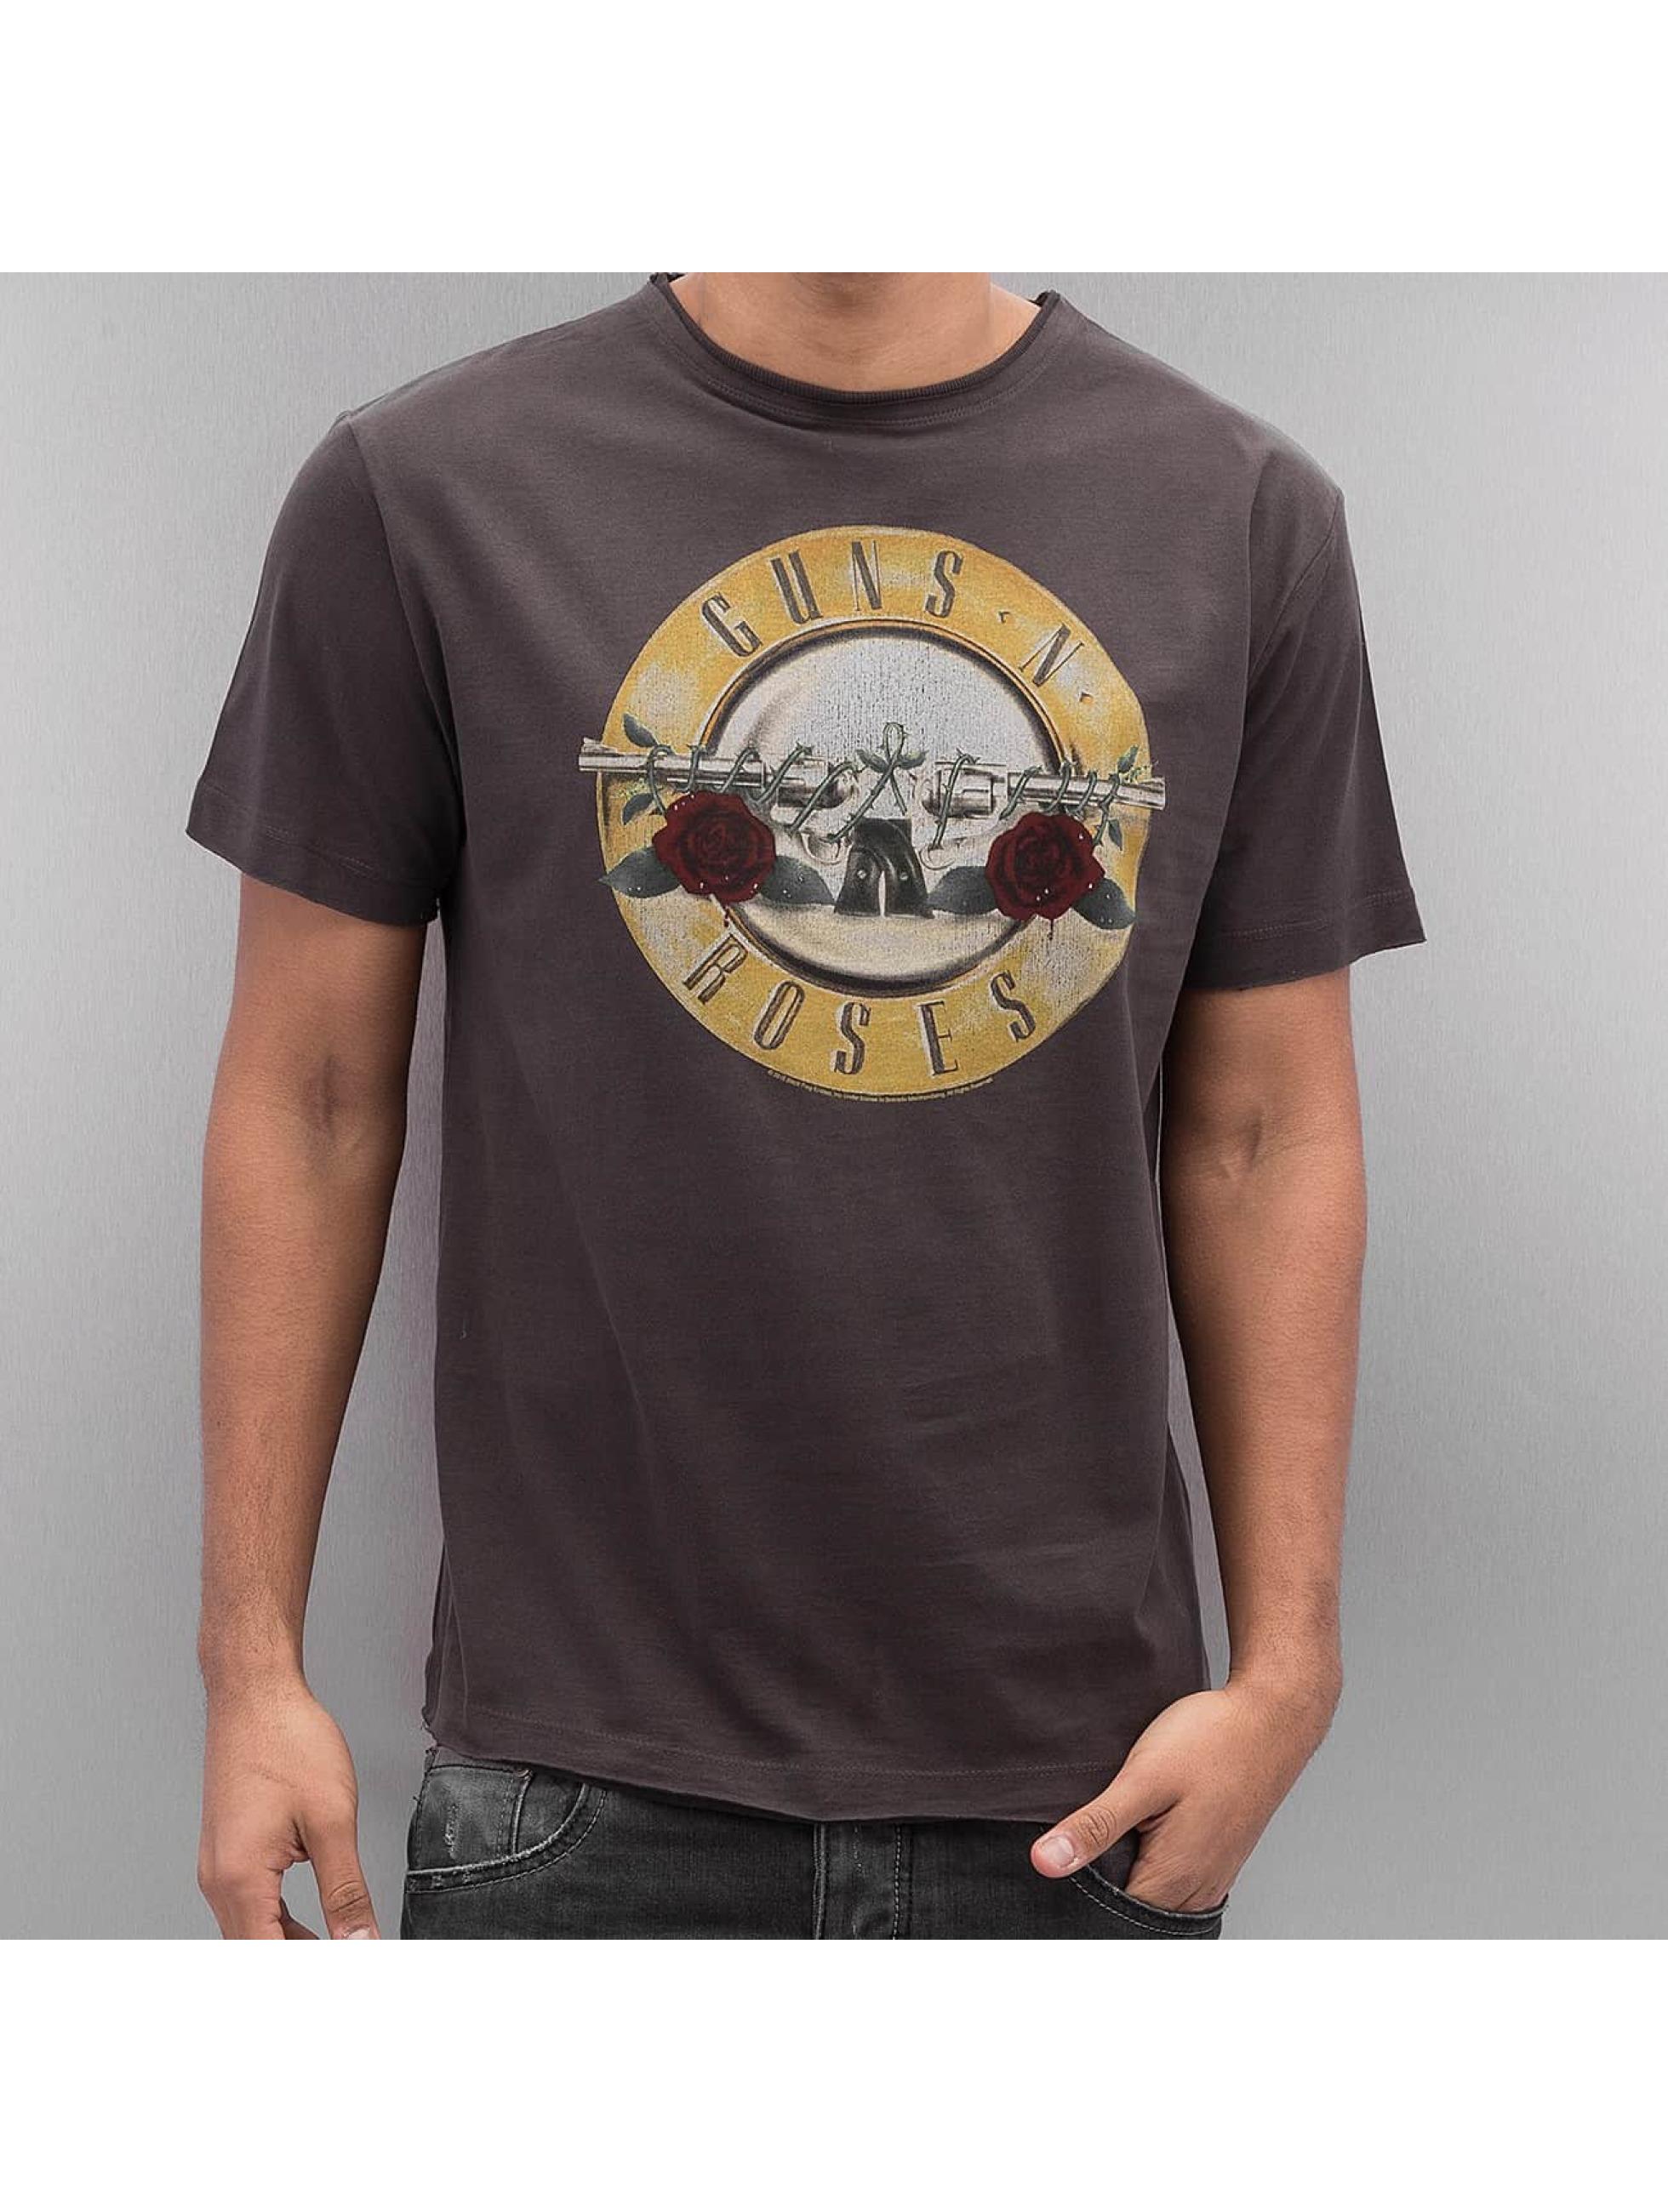 Amplified Guns Roses Drum T Shirt Charcoal